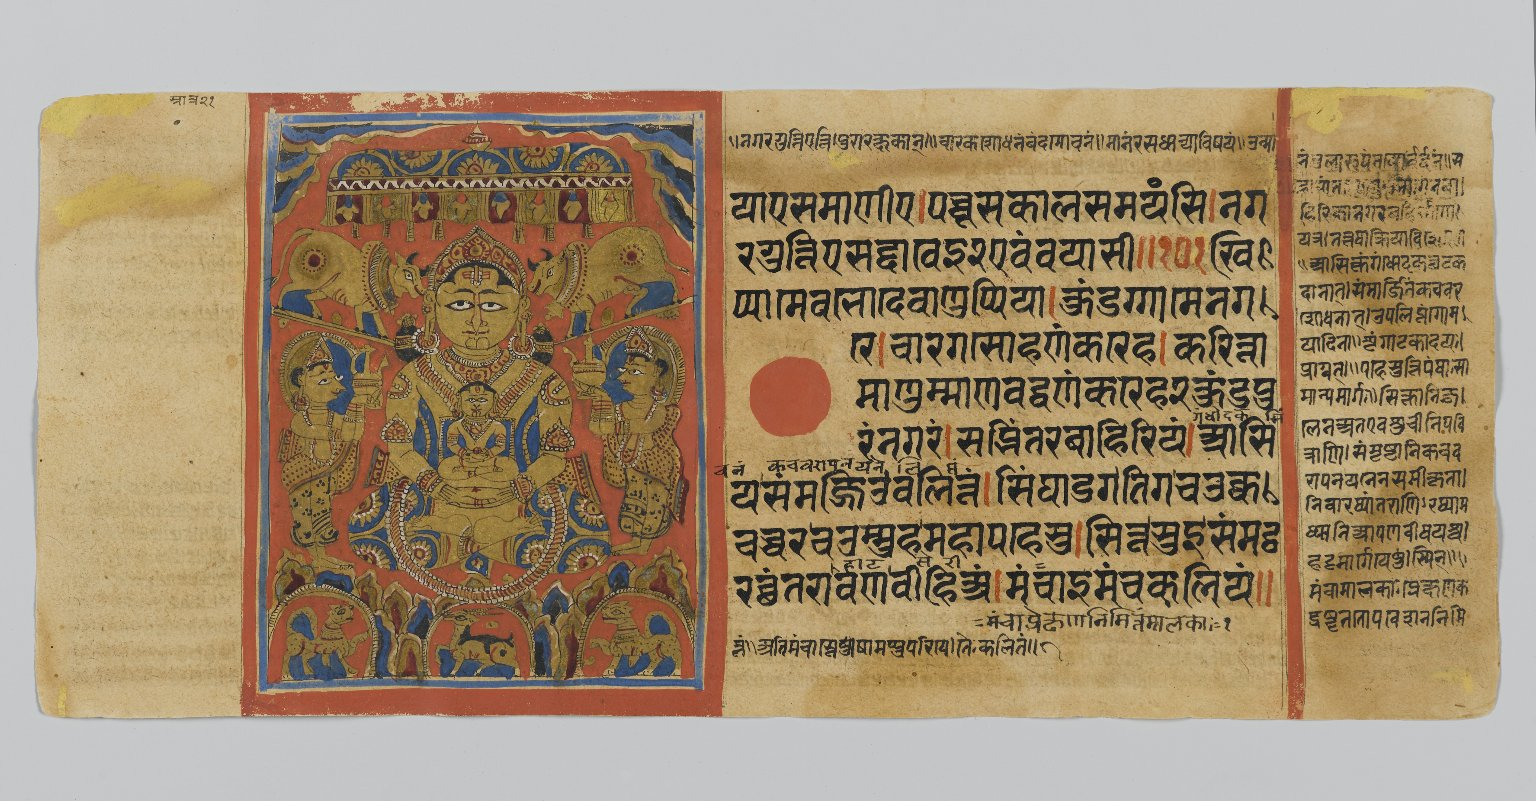 brooklyn museum - page 40 from a manuscript of the kalpasutra recto image of jamnabhisheka verso text.jpg